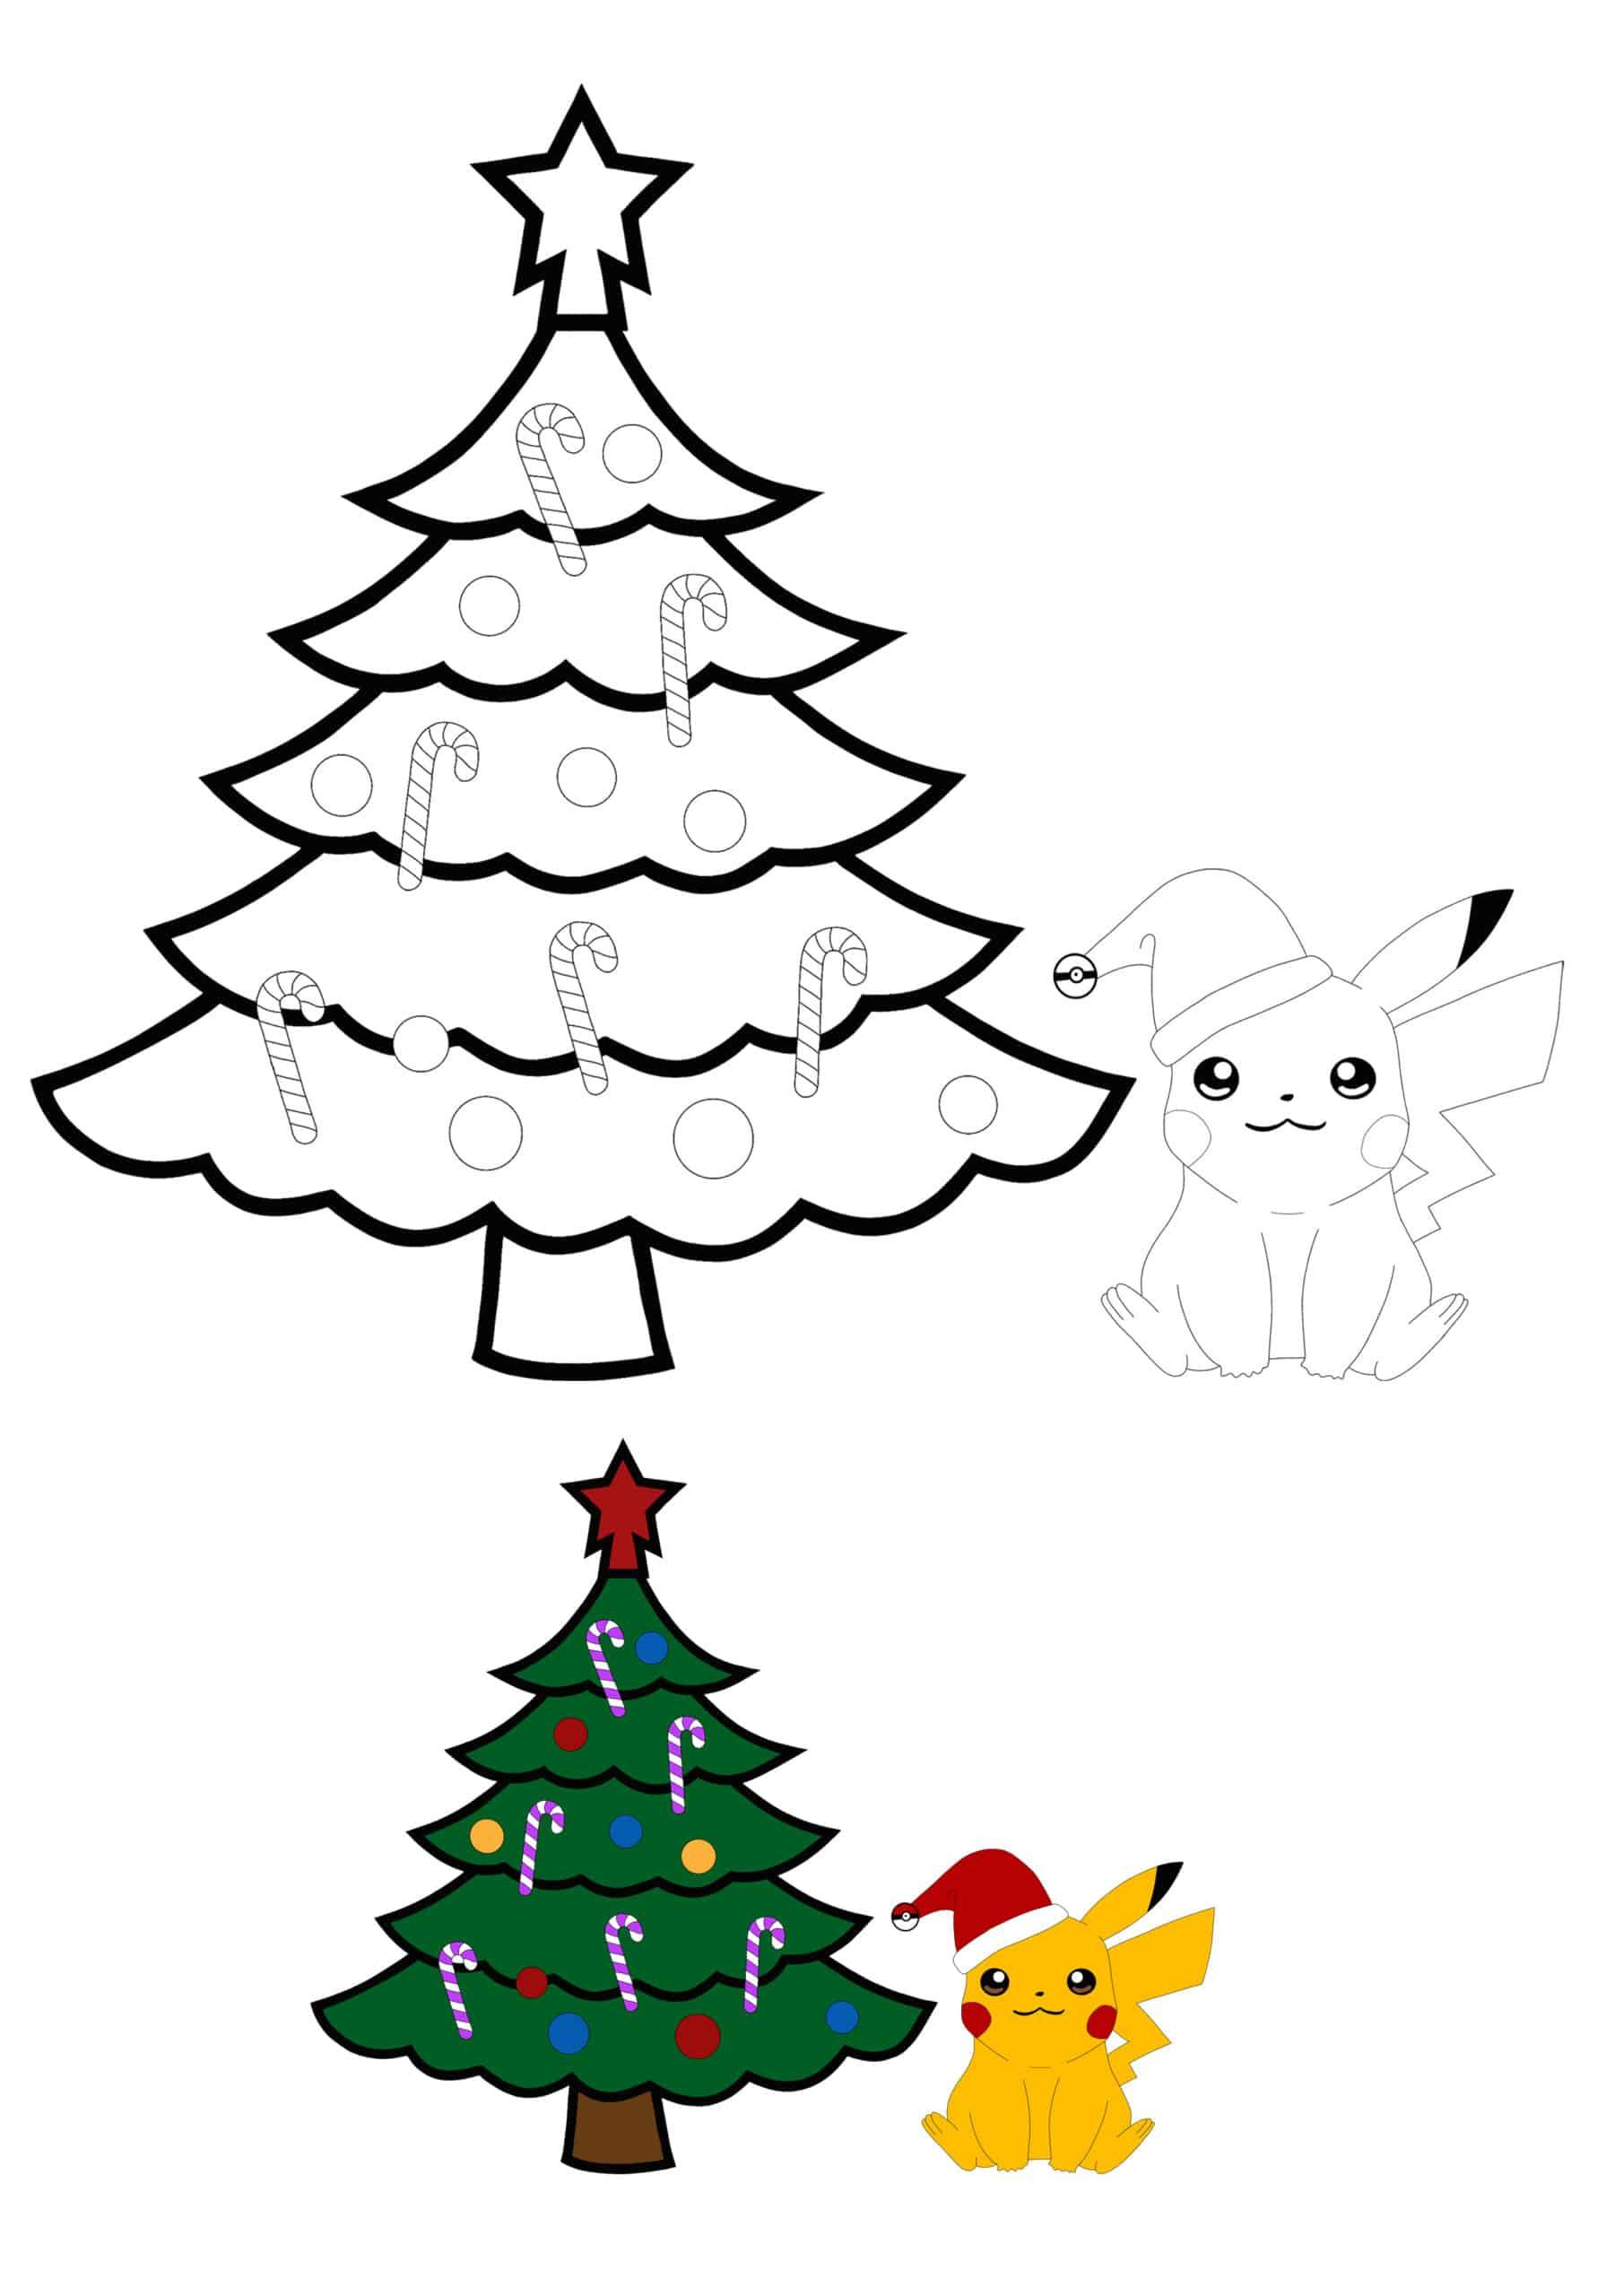 Pikachu and Christmas Tree colouring sheet